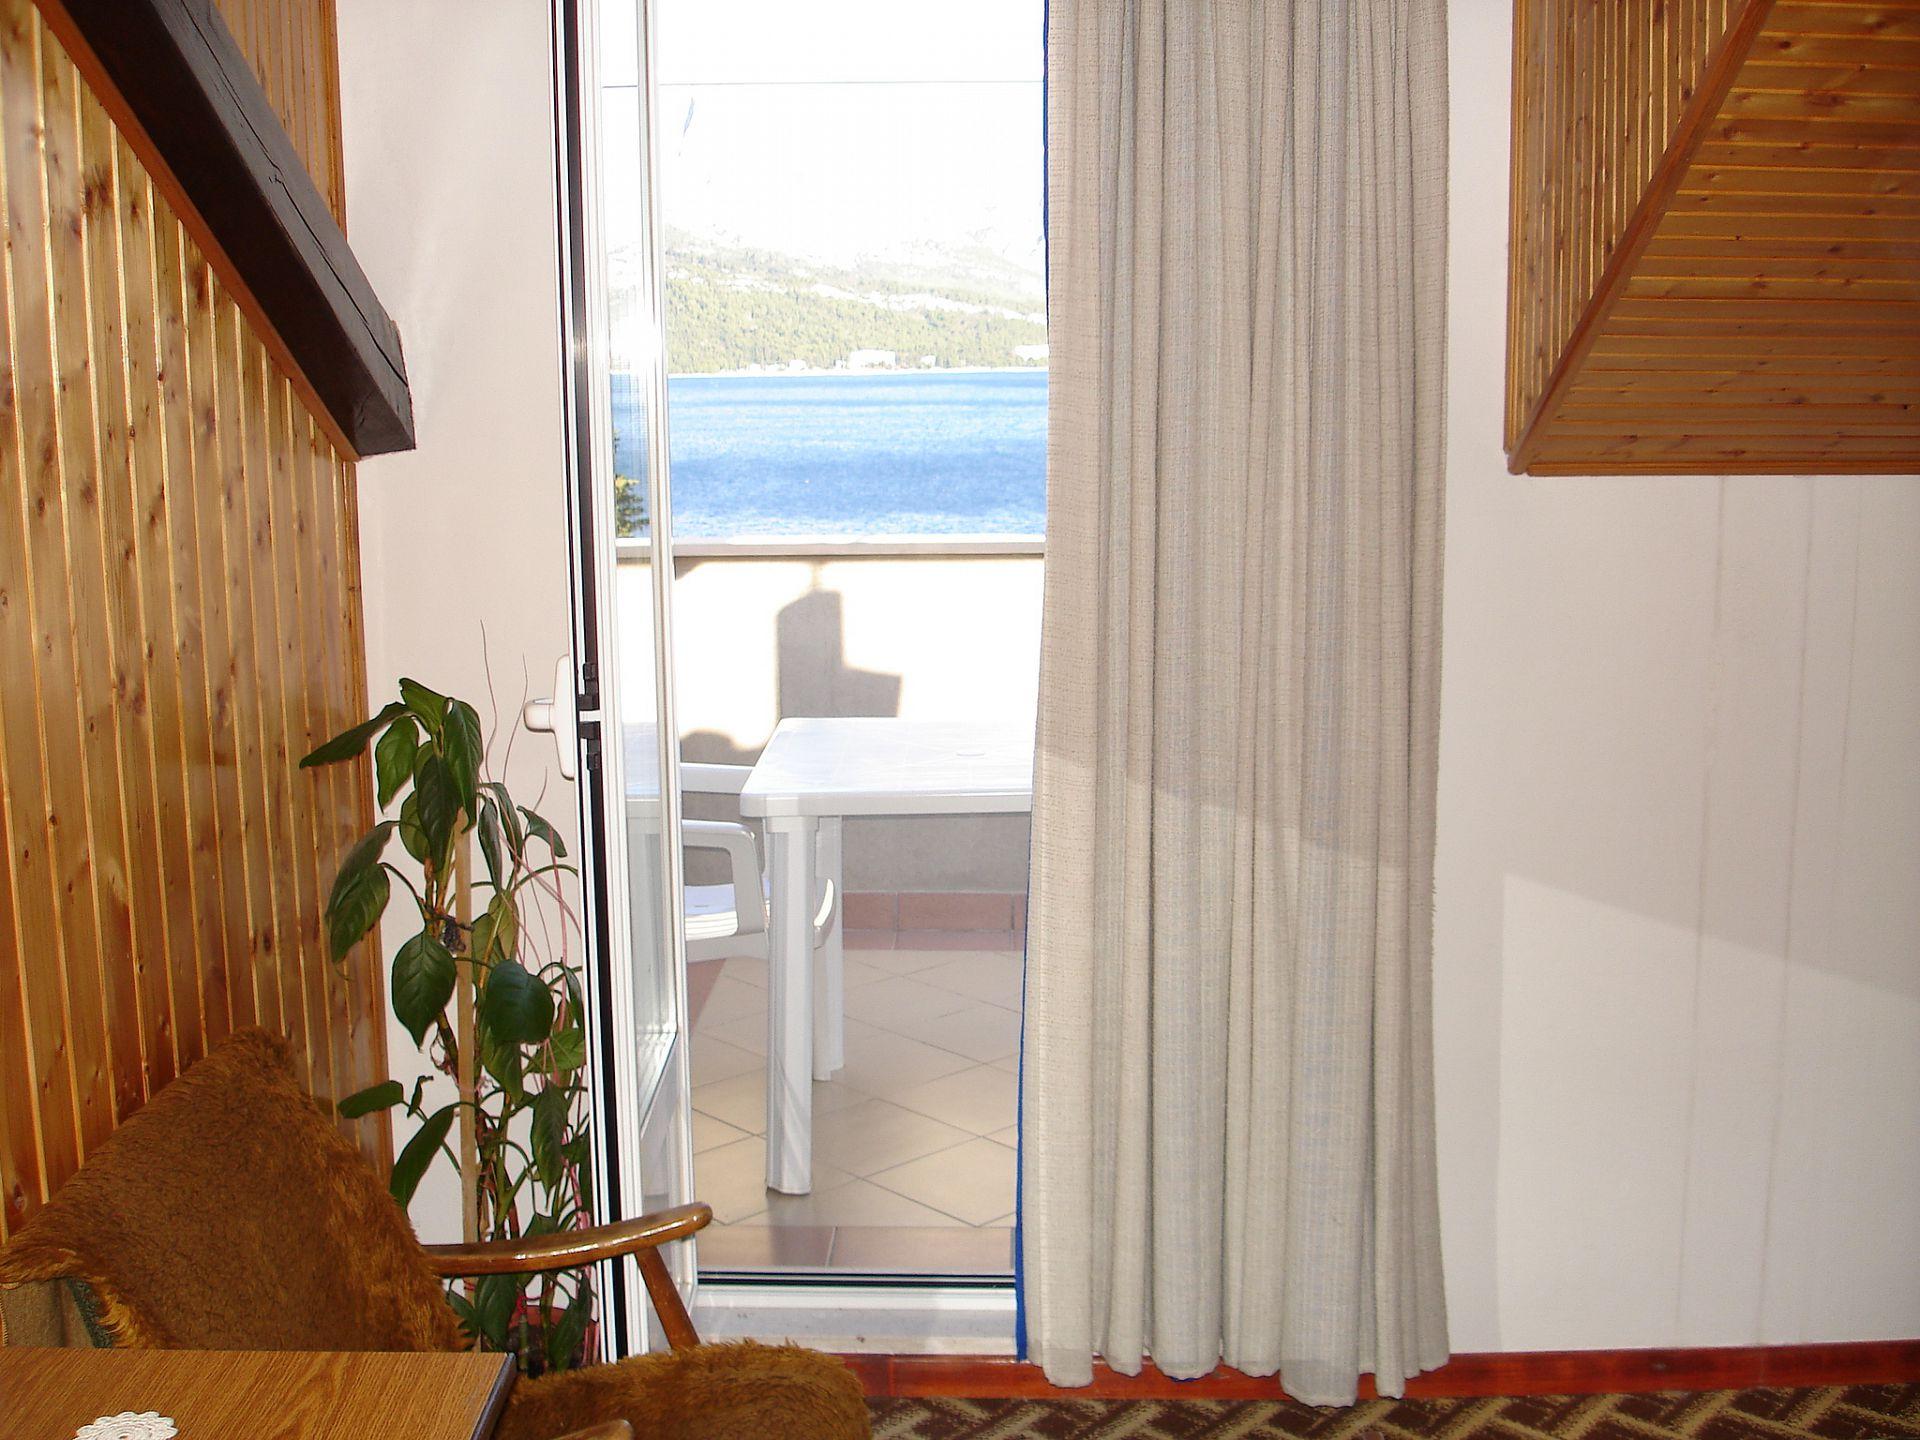 Ferienwohnung Ankica SA1(2) - Korcula (739749), Korčula, Insel Korcula, Dalmatien, Kroatien, Bild 8